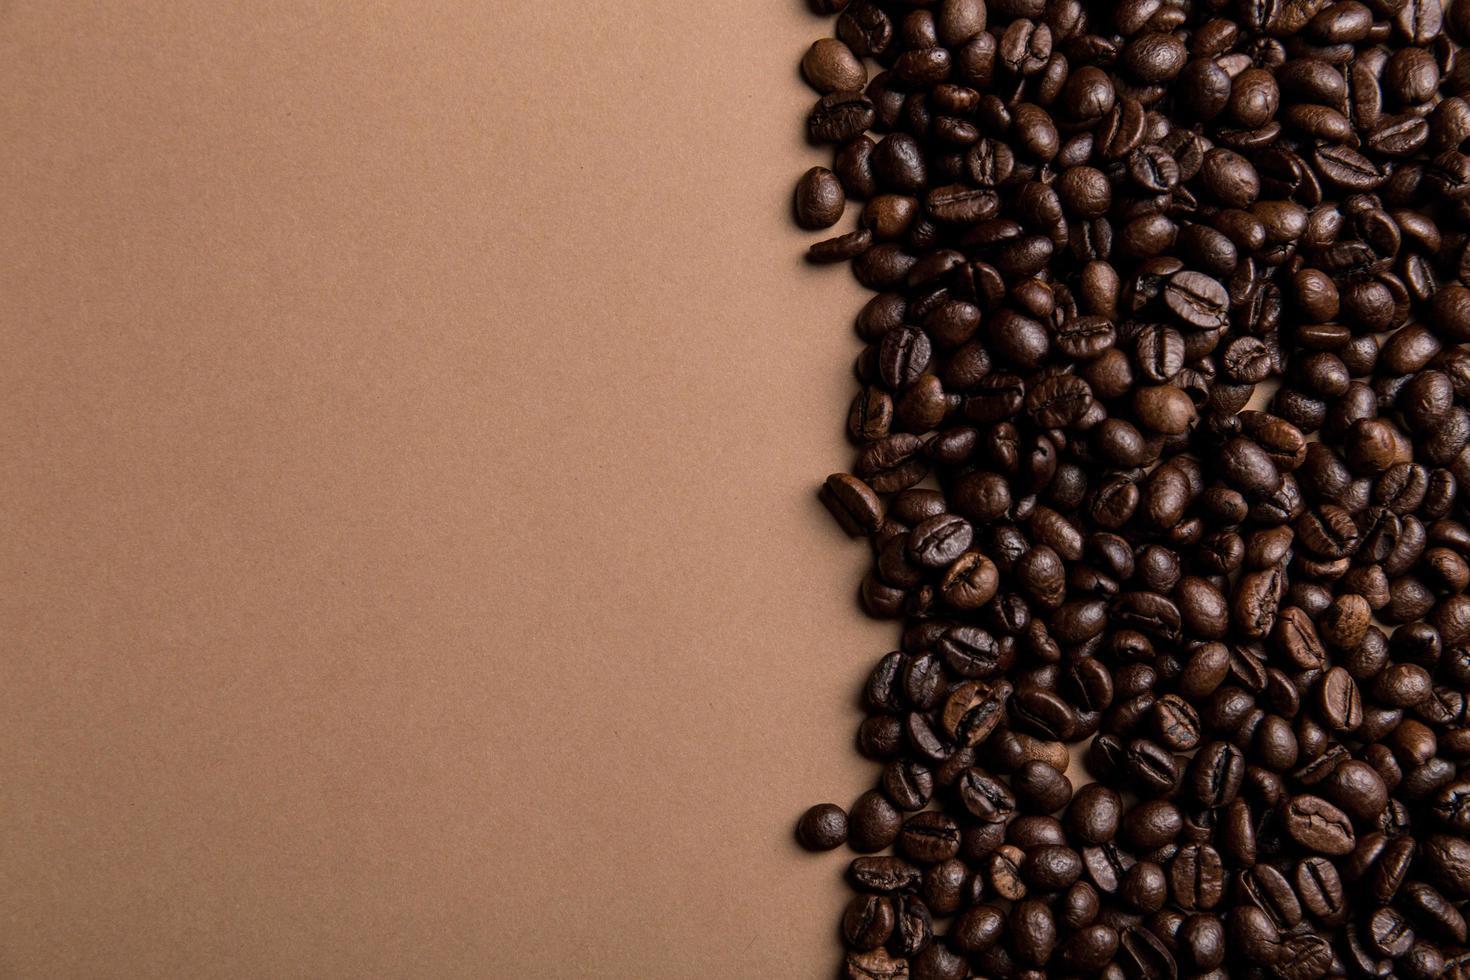 bruine koffiebonen foto